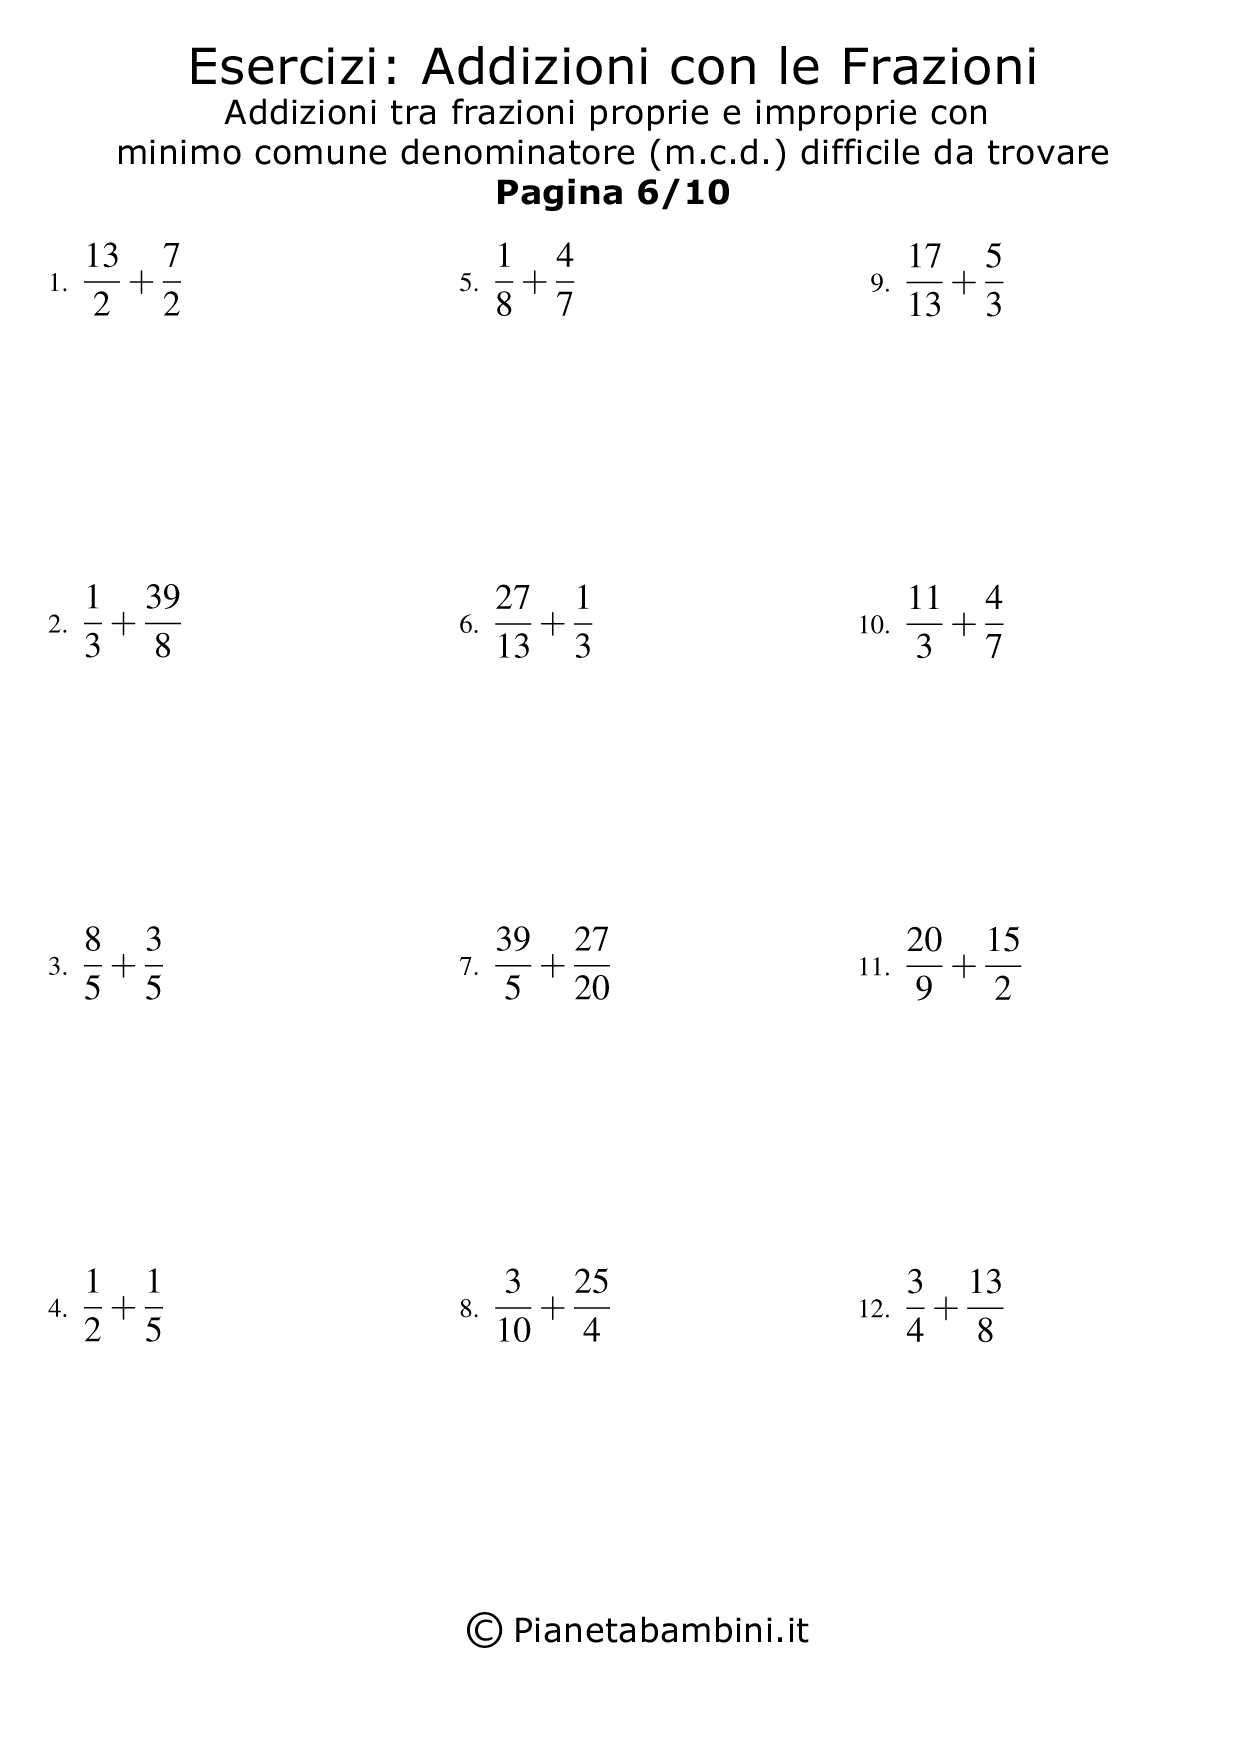 Frazioni-Proprie-Improprie-m.c.d-difficile_06